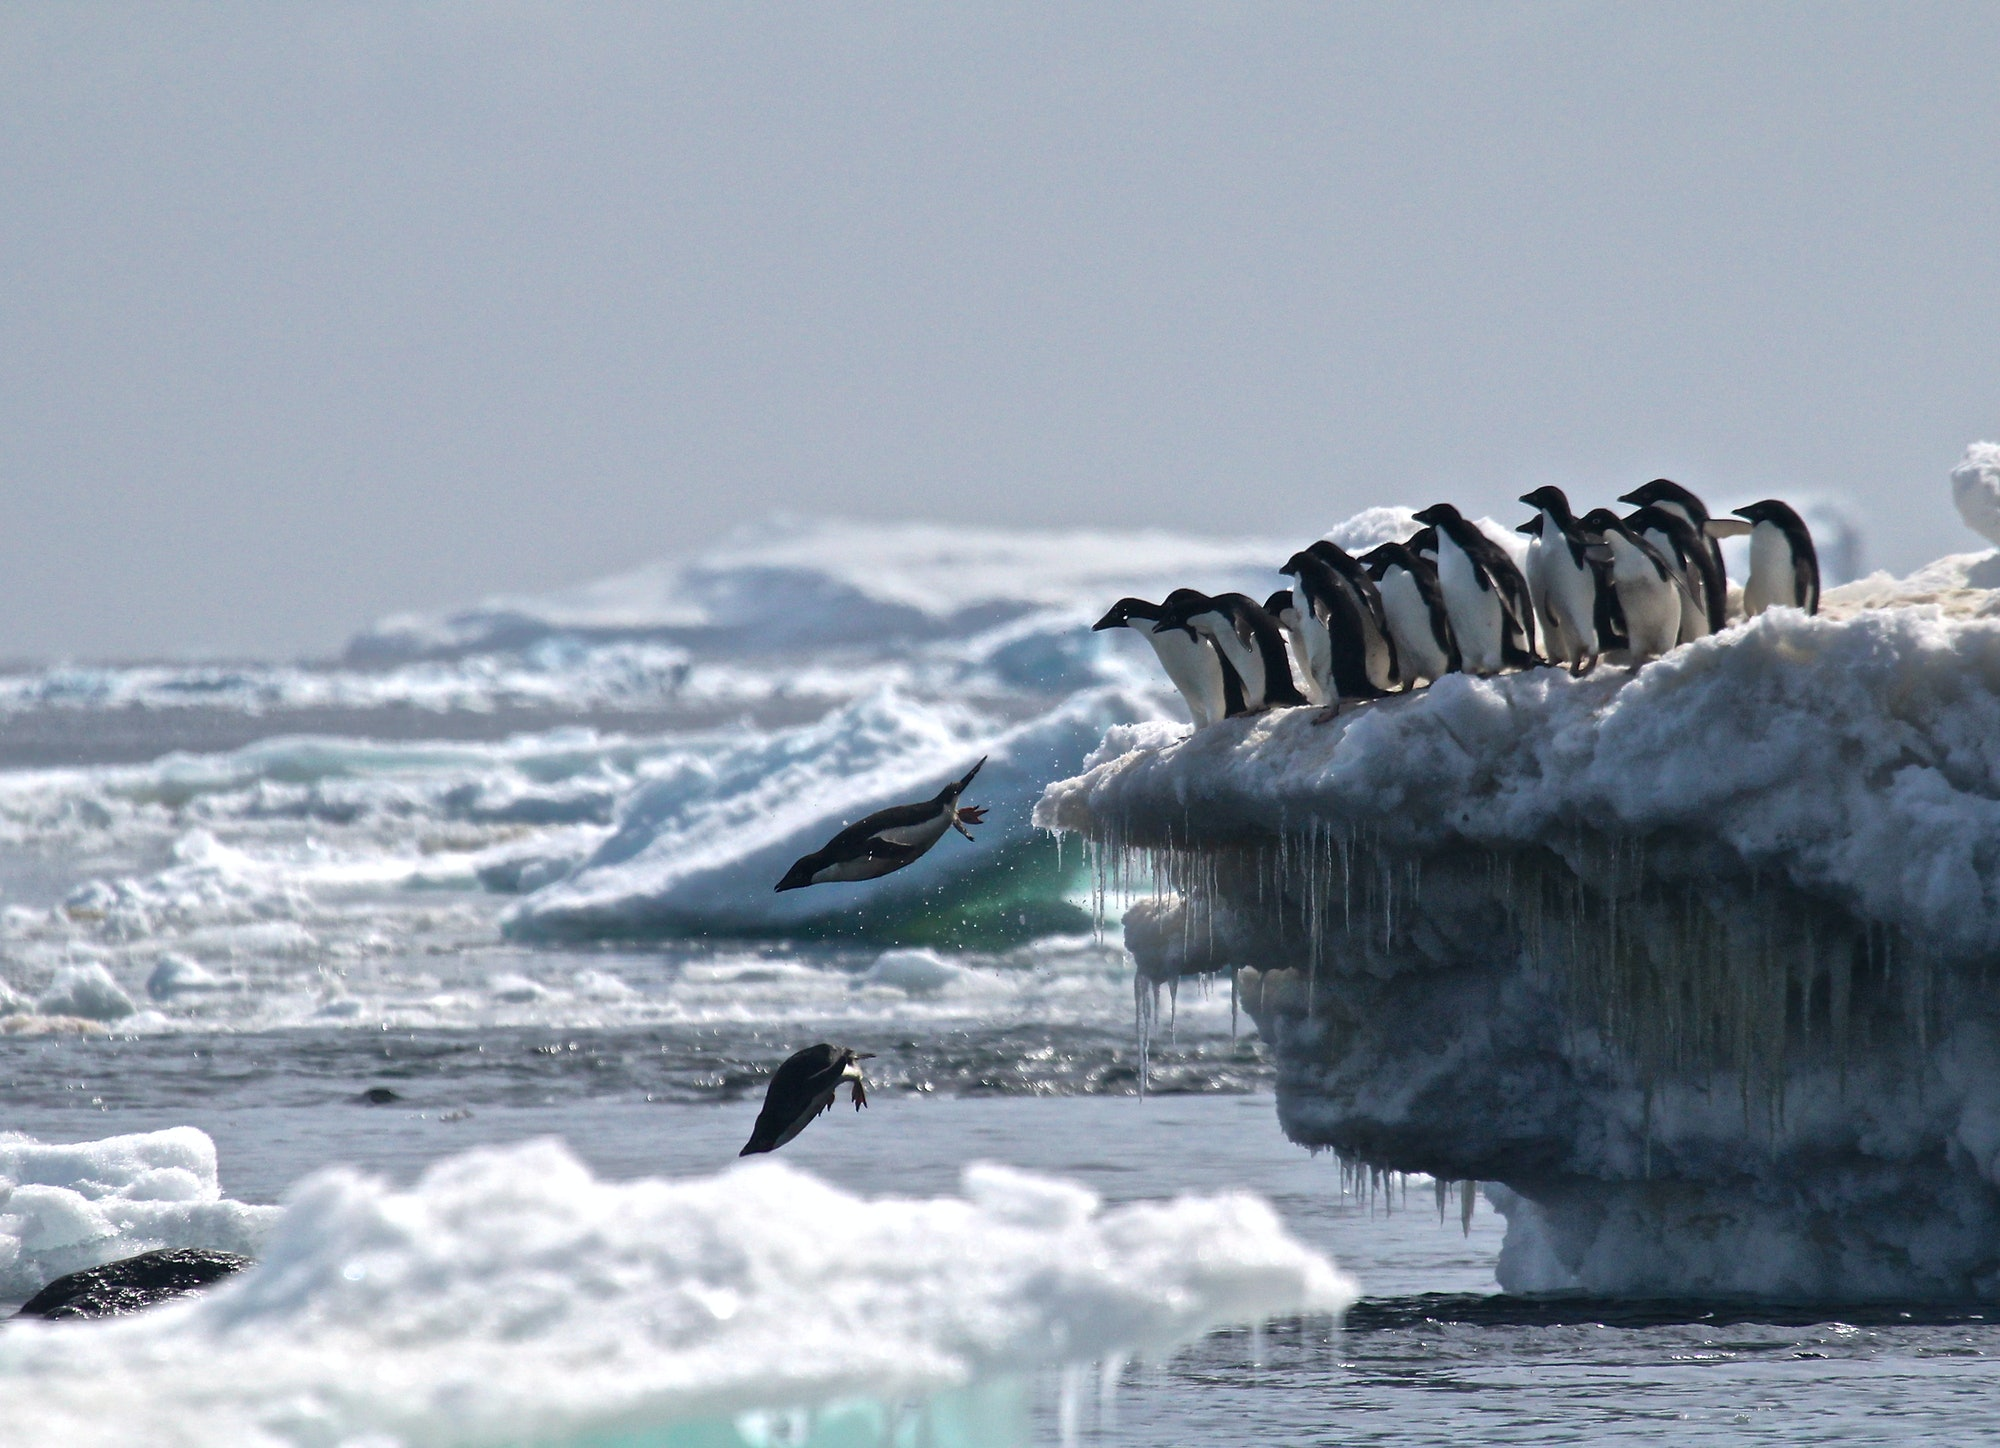 Penguins, Antartica